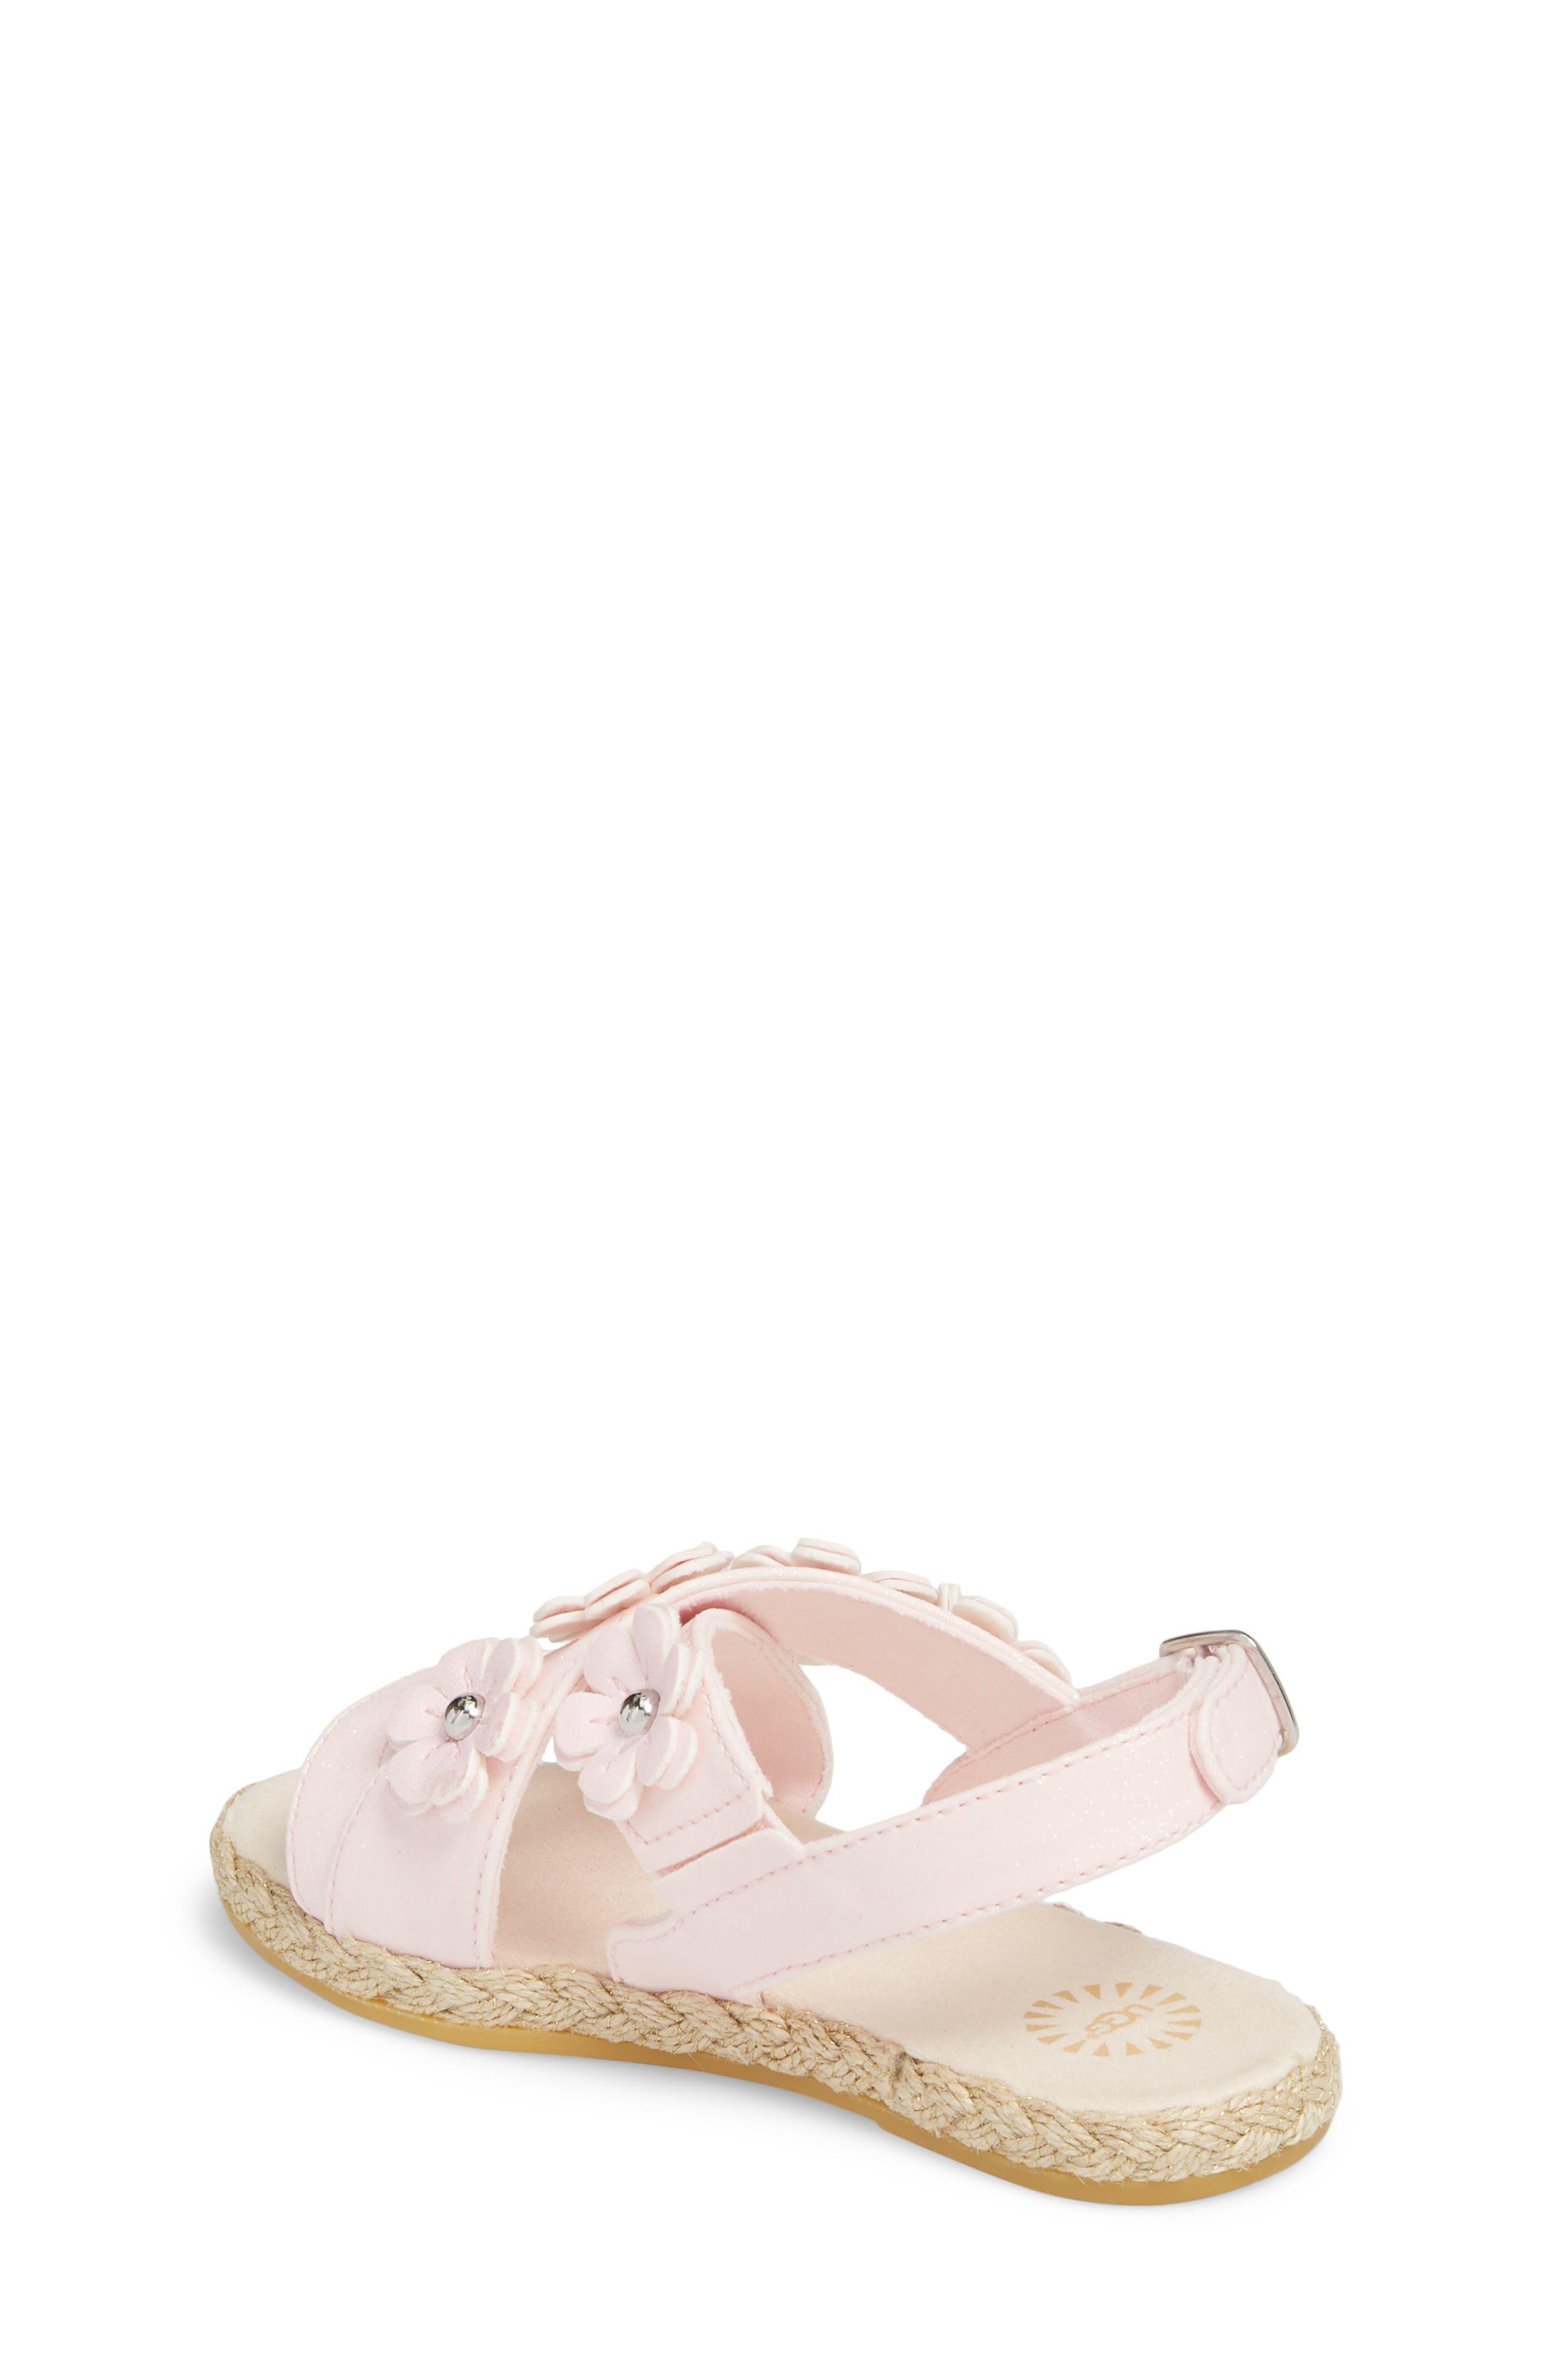 UGG<SUP>®</SUP>, Allairey Sparkles Espadrille Sandal, Alternate thumbnail 2, color, SEASHELL PINK